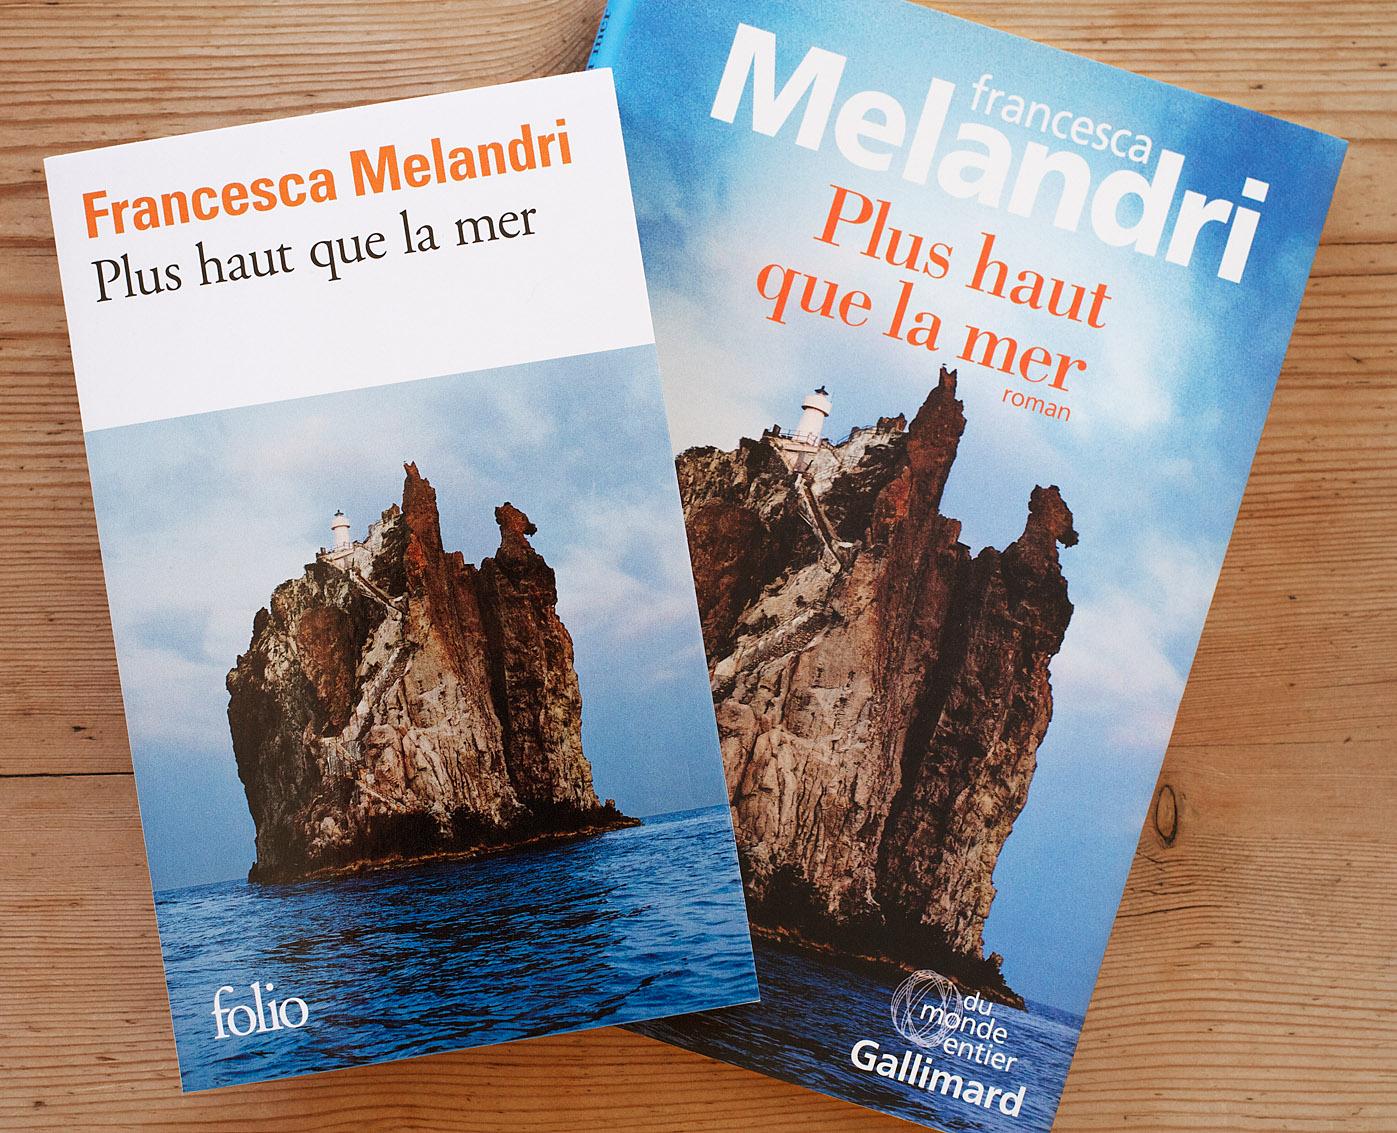 """Plus que la mer"" Francesca Melandri, Editions Gallimard"